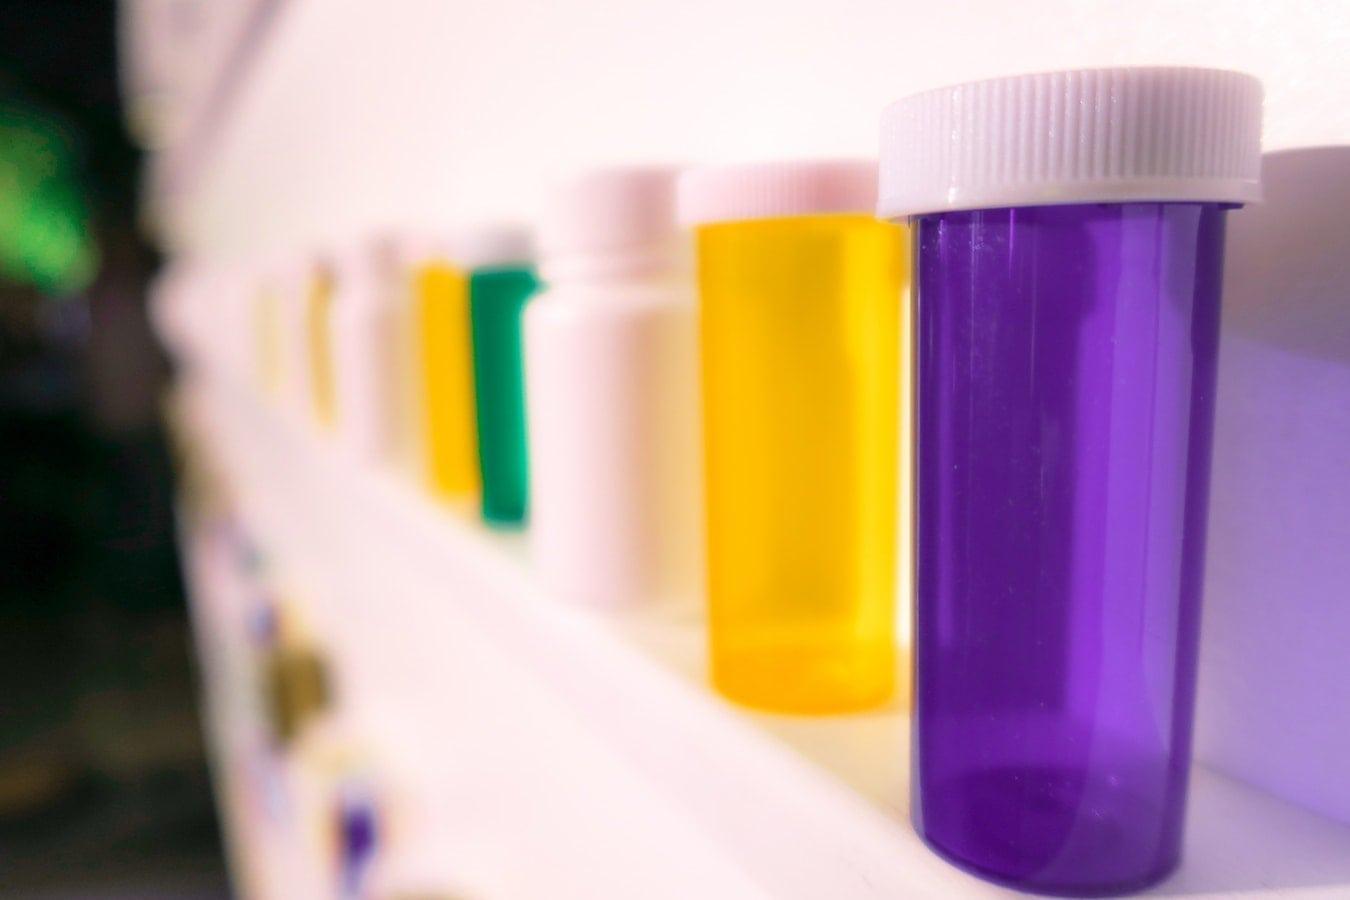 Teva Pharmaceuticals: Rebound-Chance?